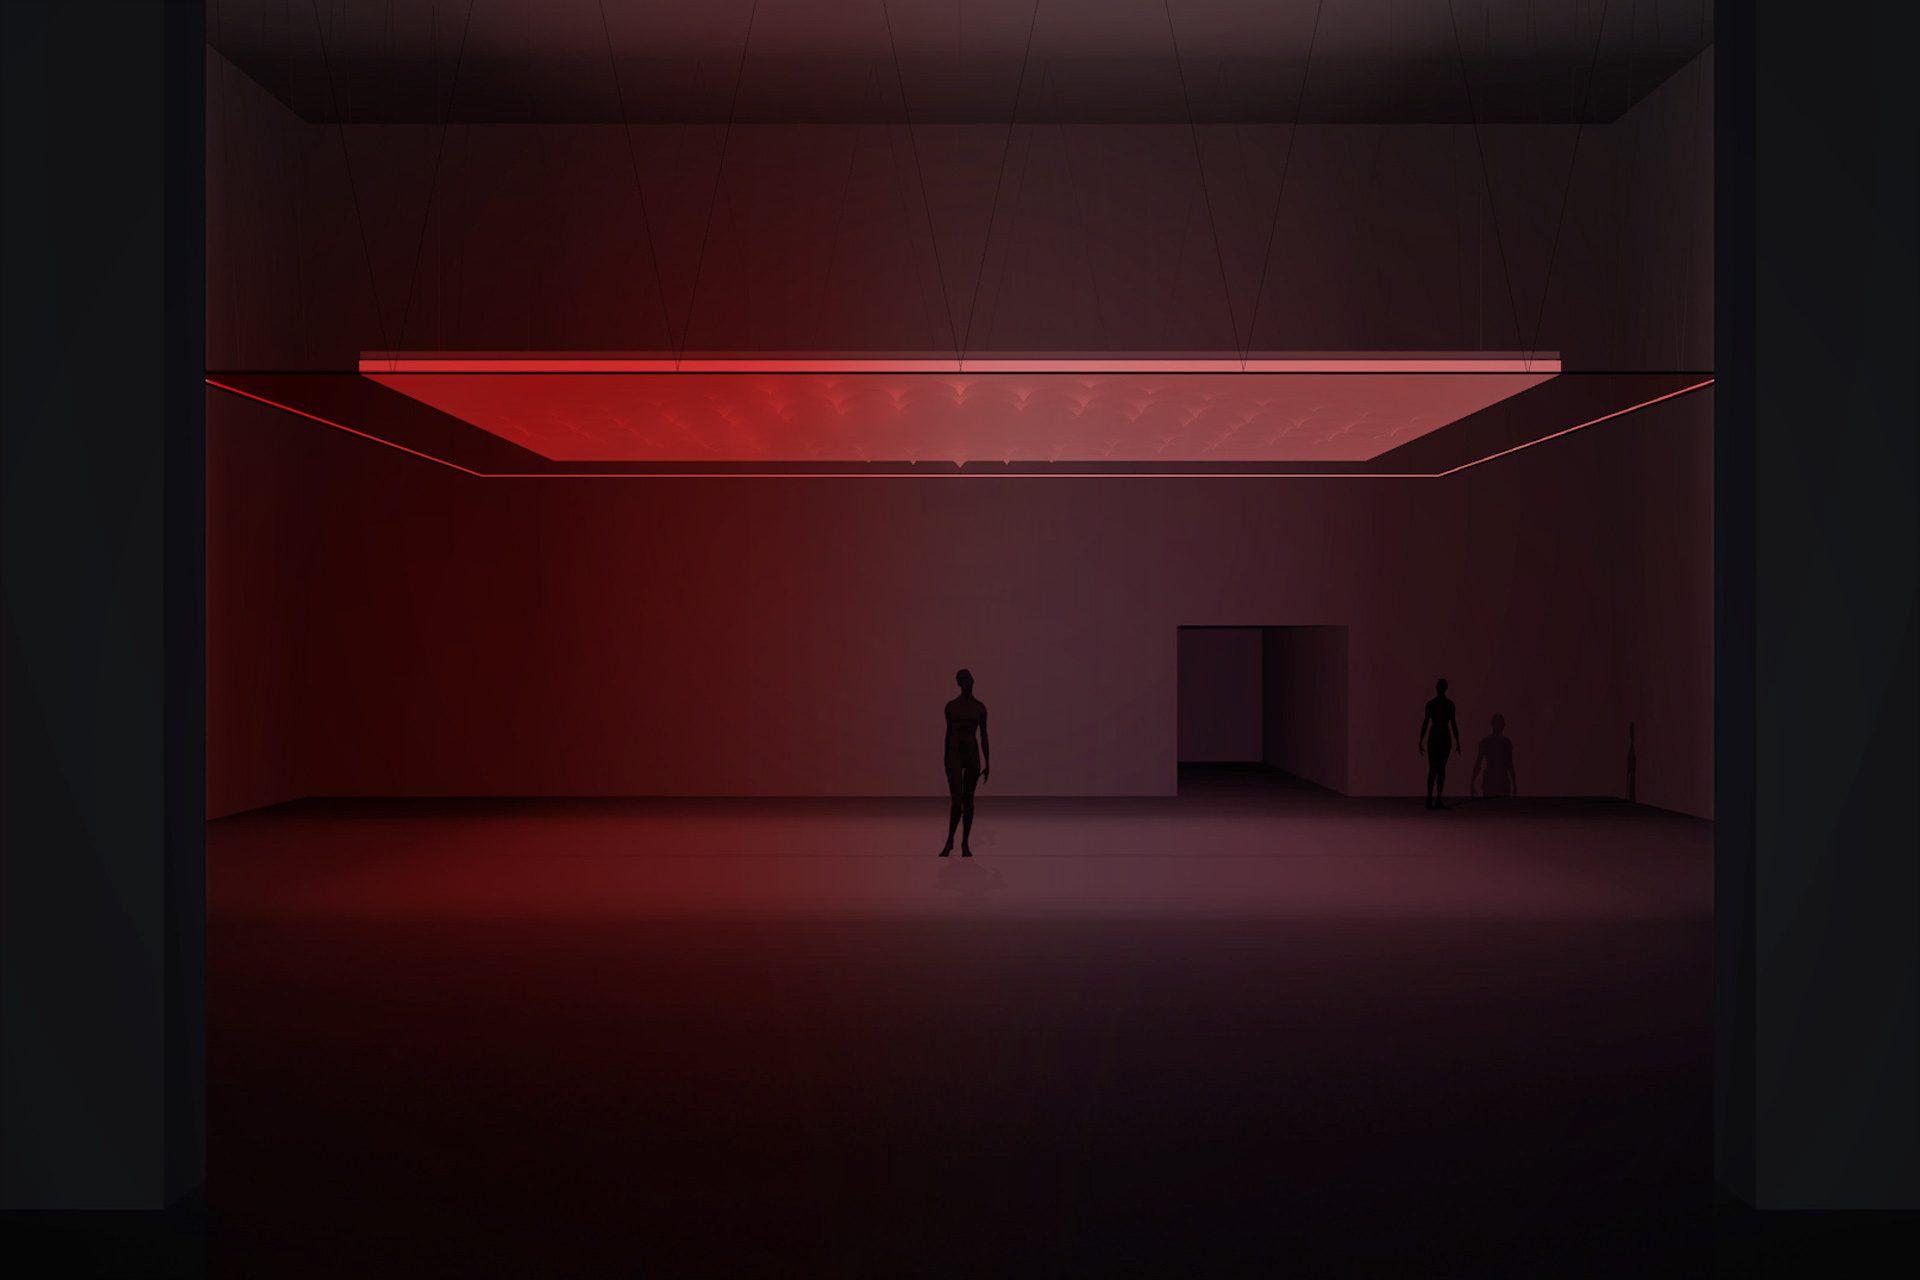 Installation with RGB light setting